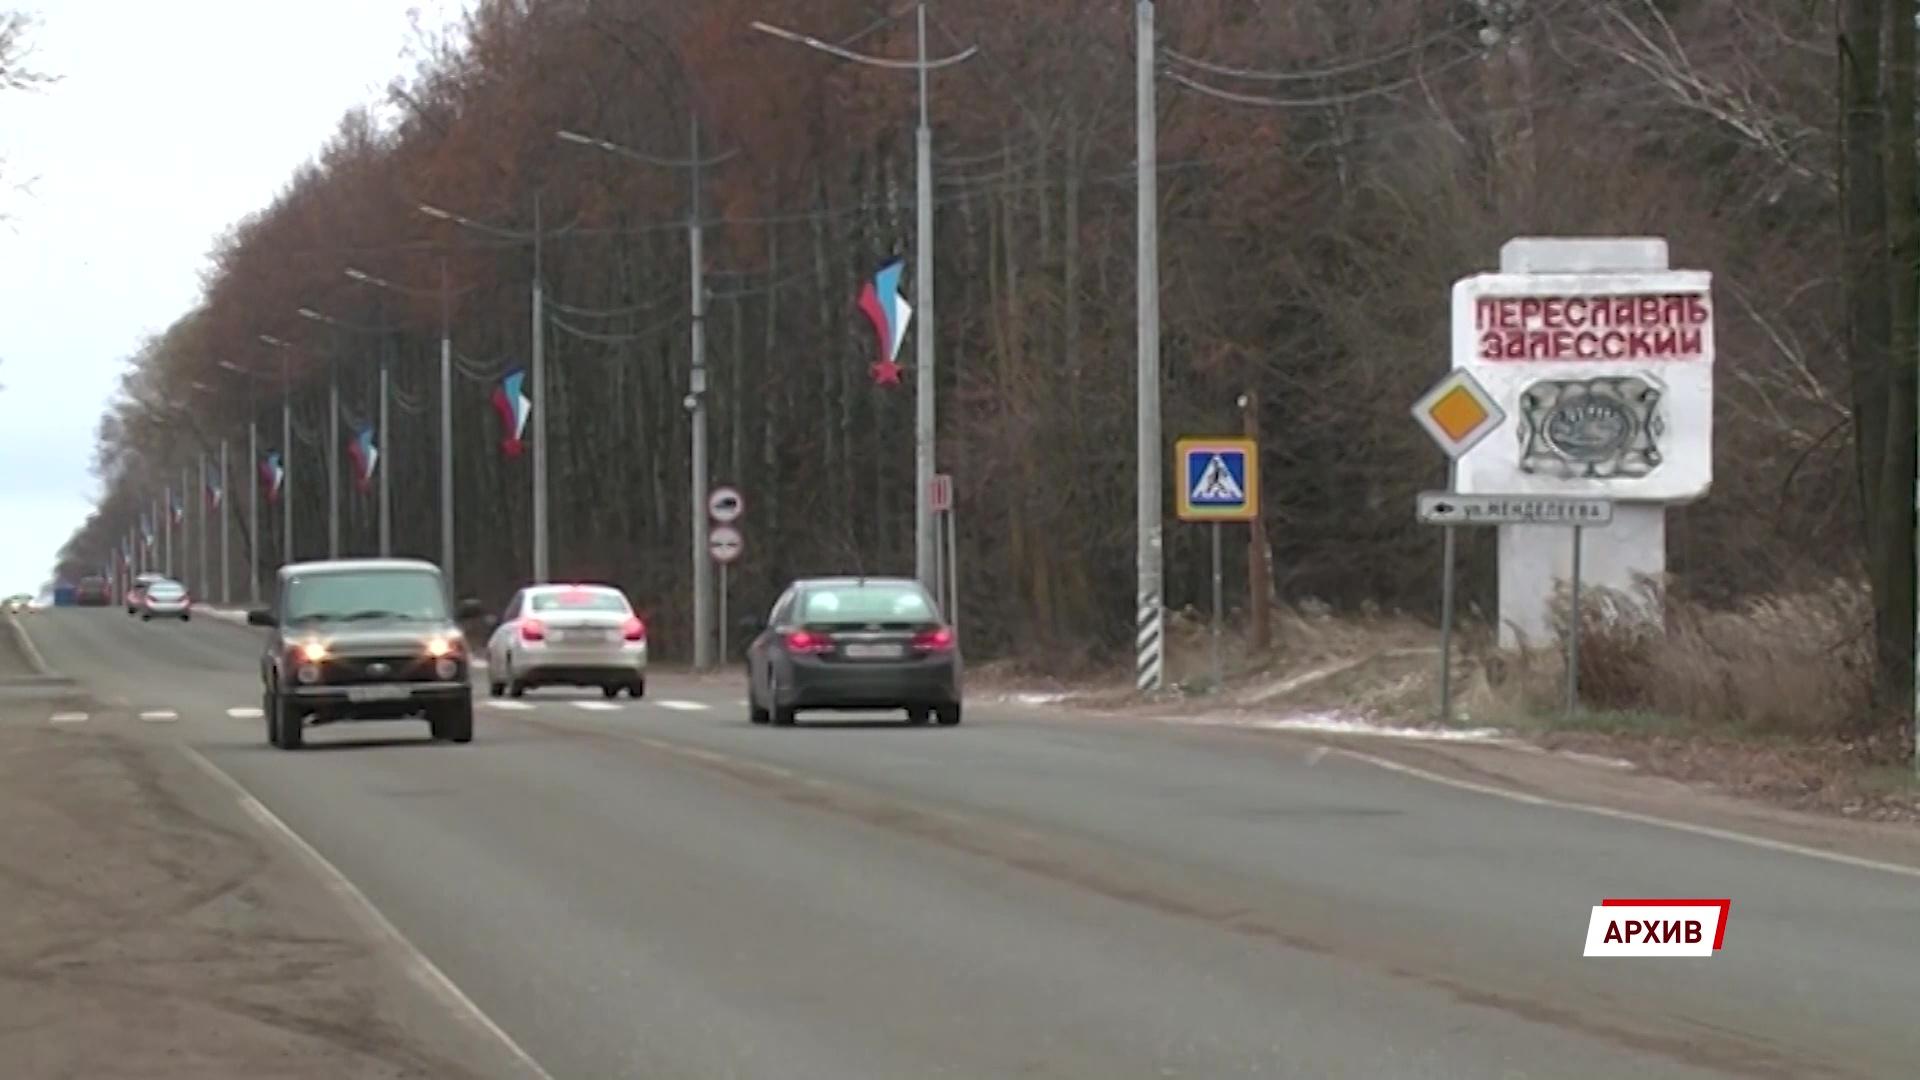 Экс-депутата переславского заксобрания отправили в колонию за убийство таксиста